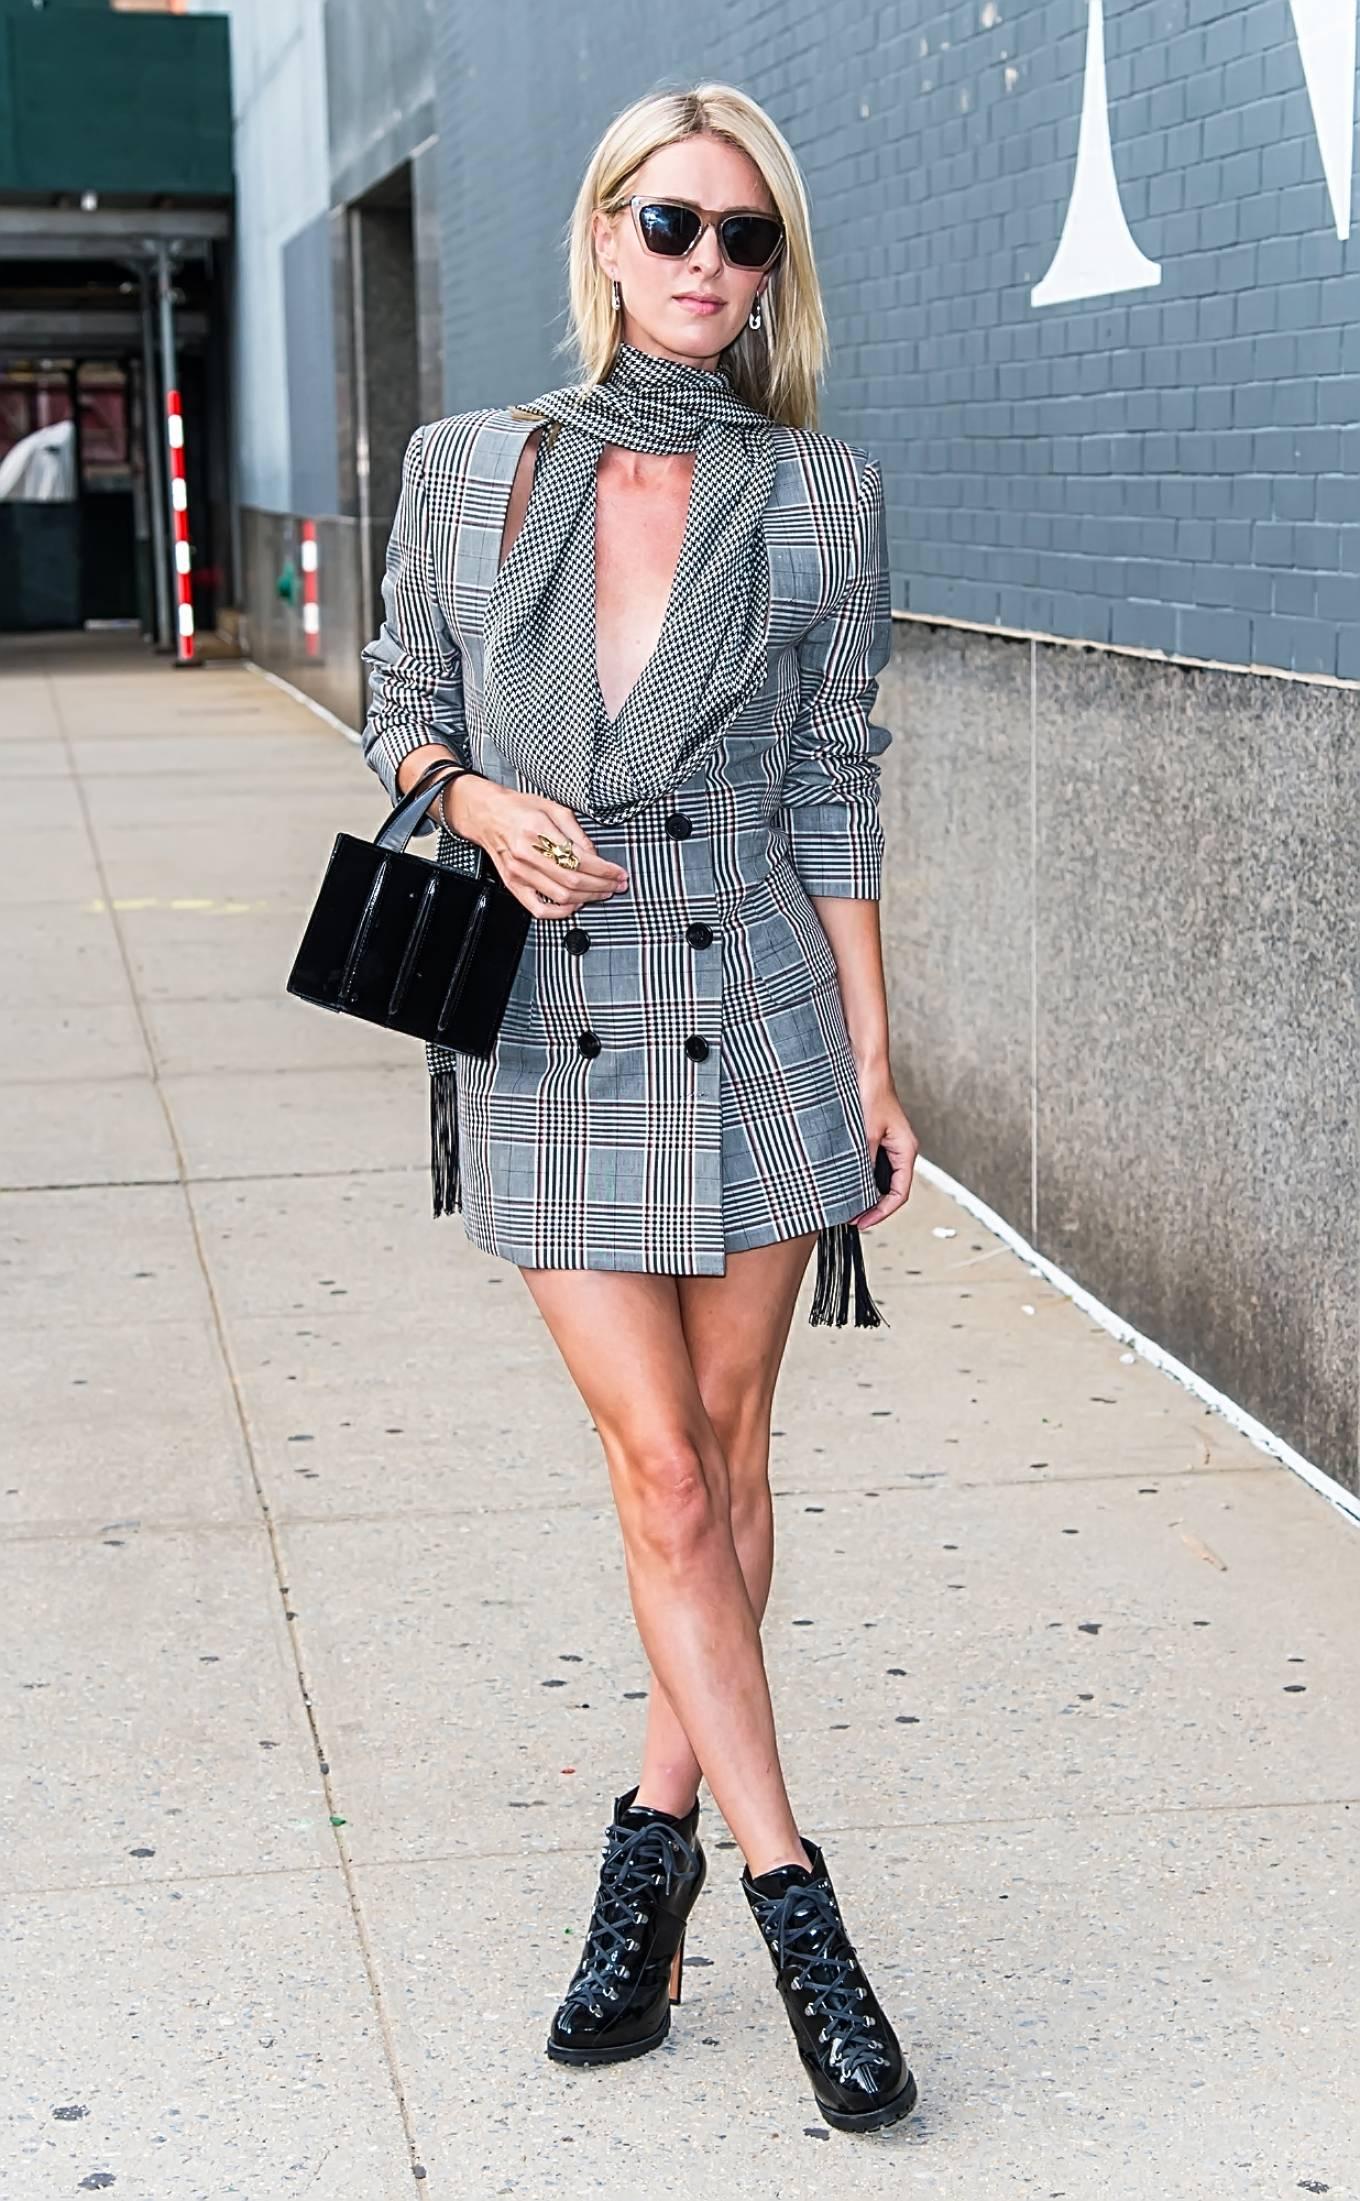 Nicky Hilton 2020 : Nicky Hilton – New York Fashion Week – Monse Fall-Winter 2020 Presentation-06